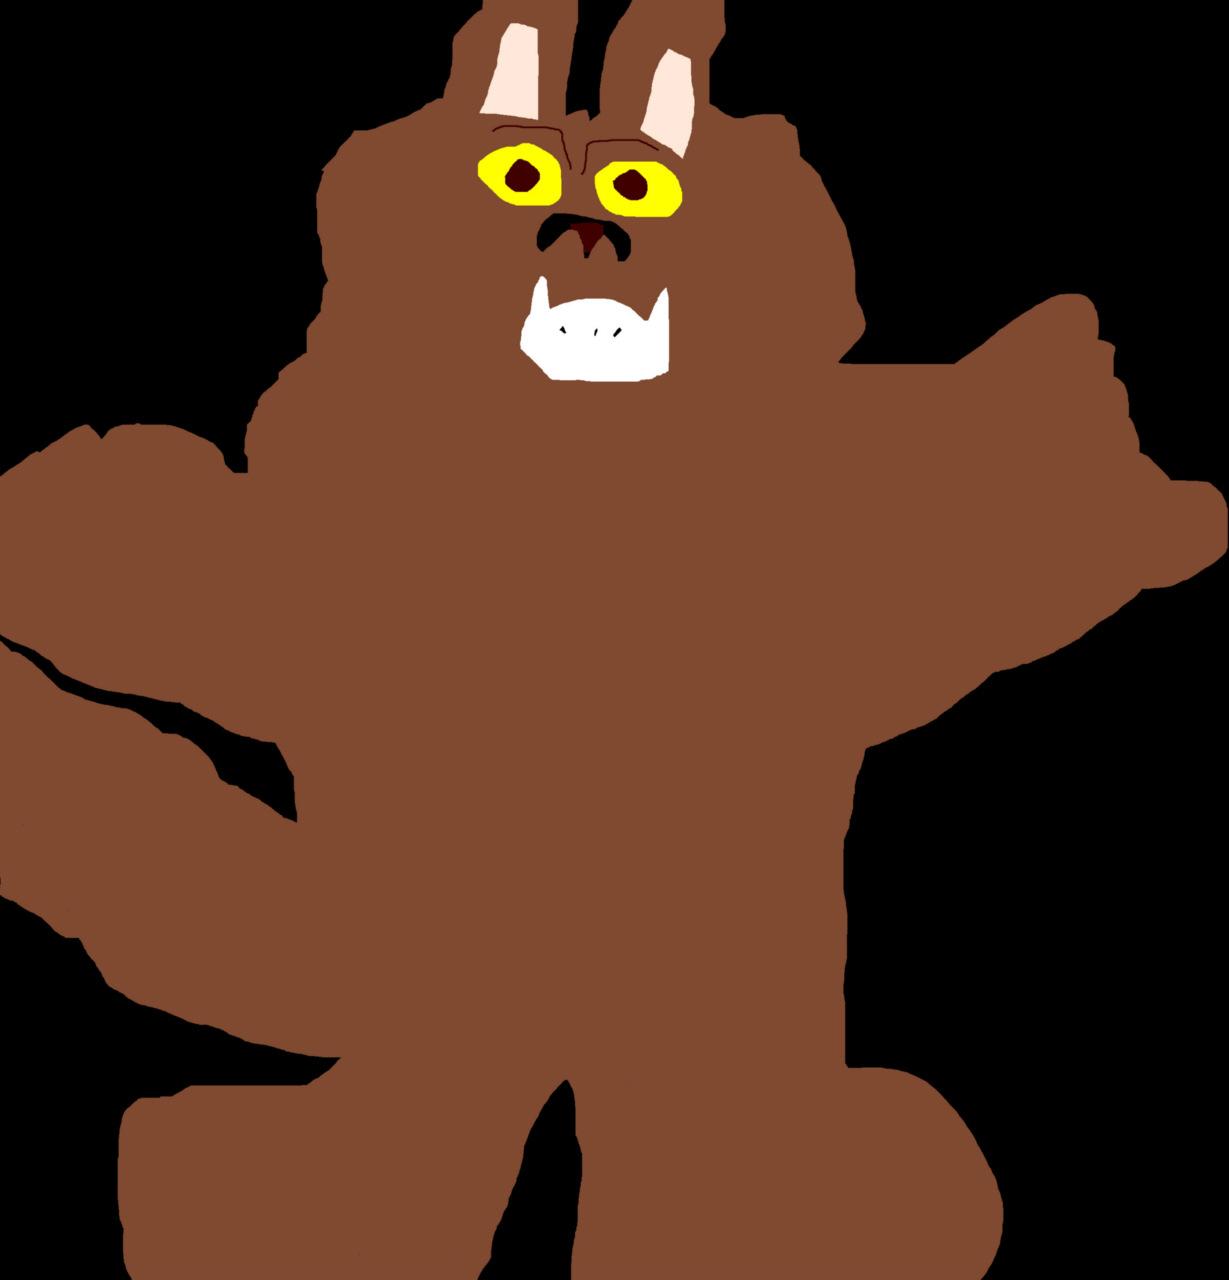 Another Toony Werewolf MS Paint^u^ by Falconlobo